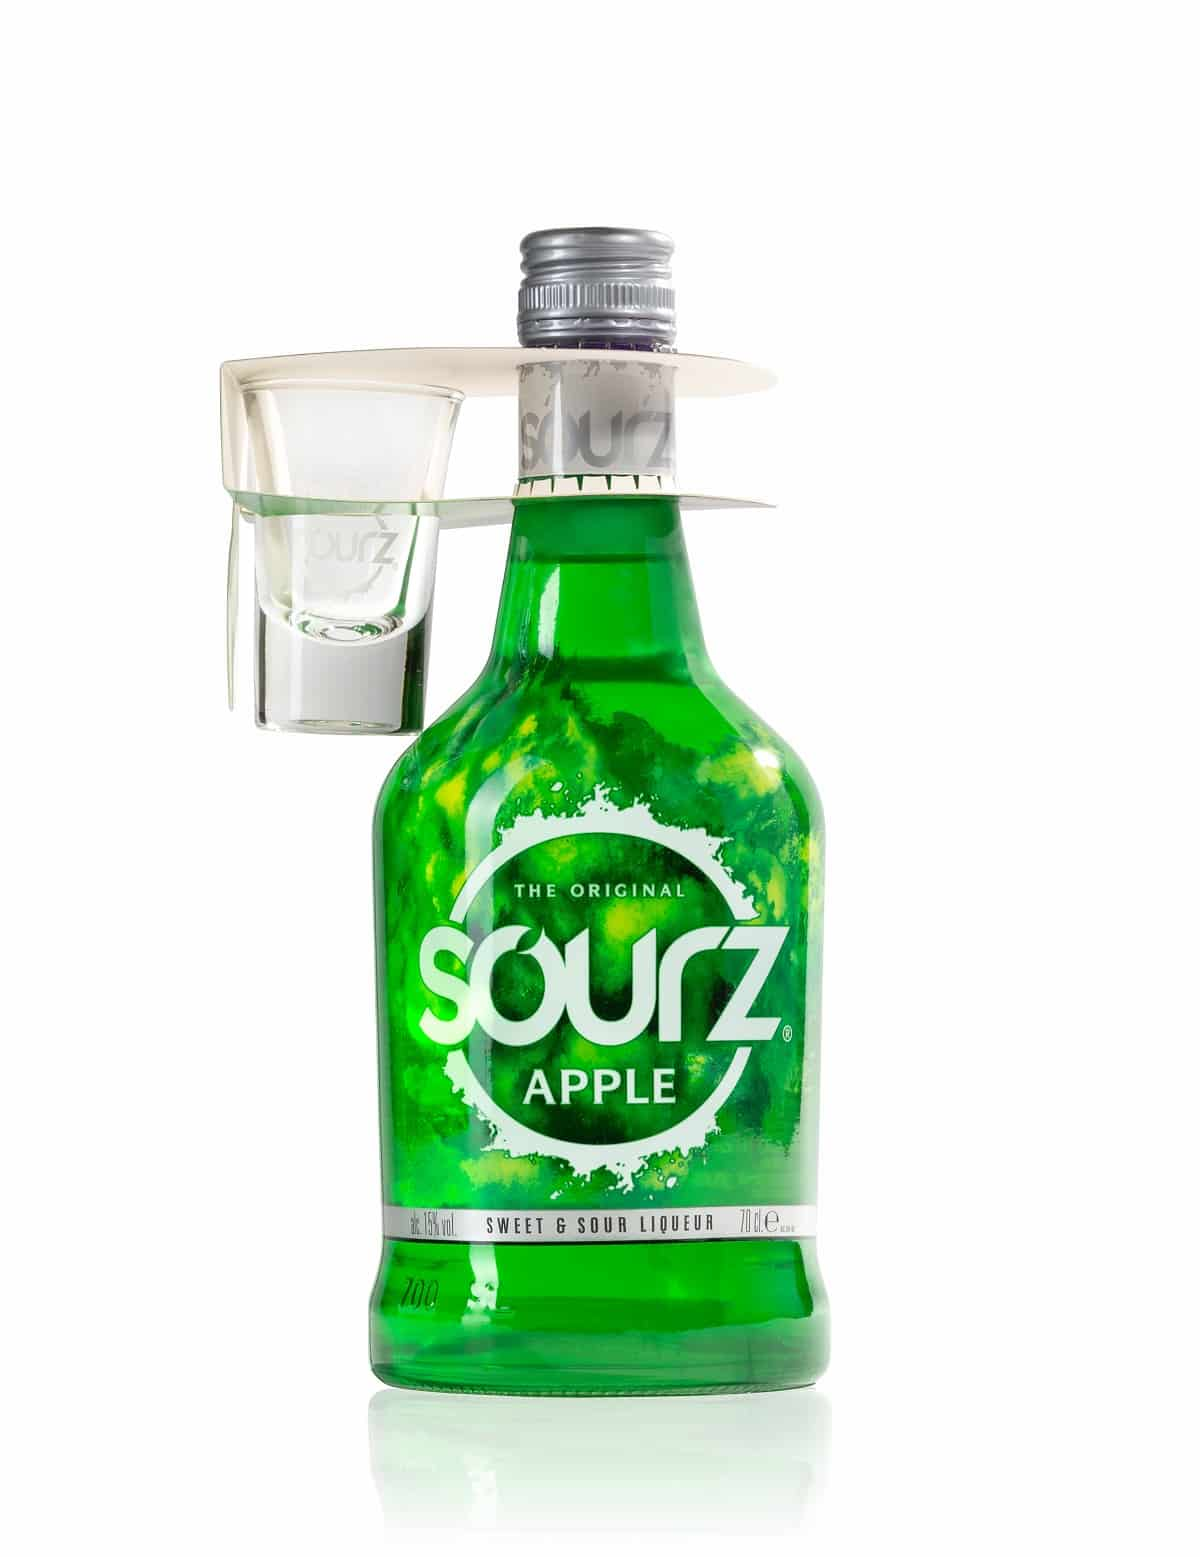 2020 08 14 SHMDSGN Sourz Bottle Shm PM3A9926 Bearbeitet